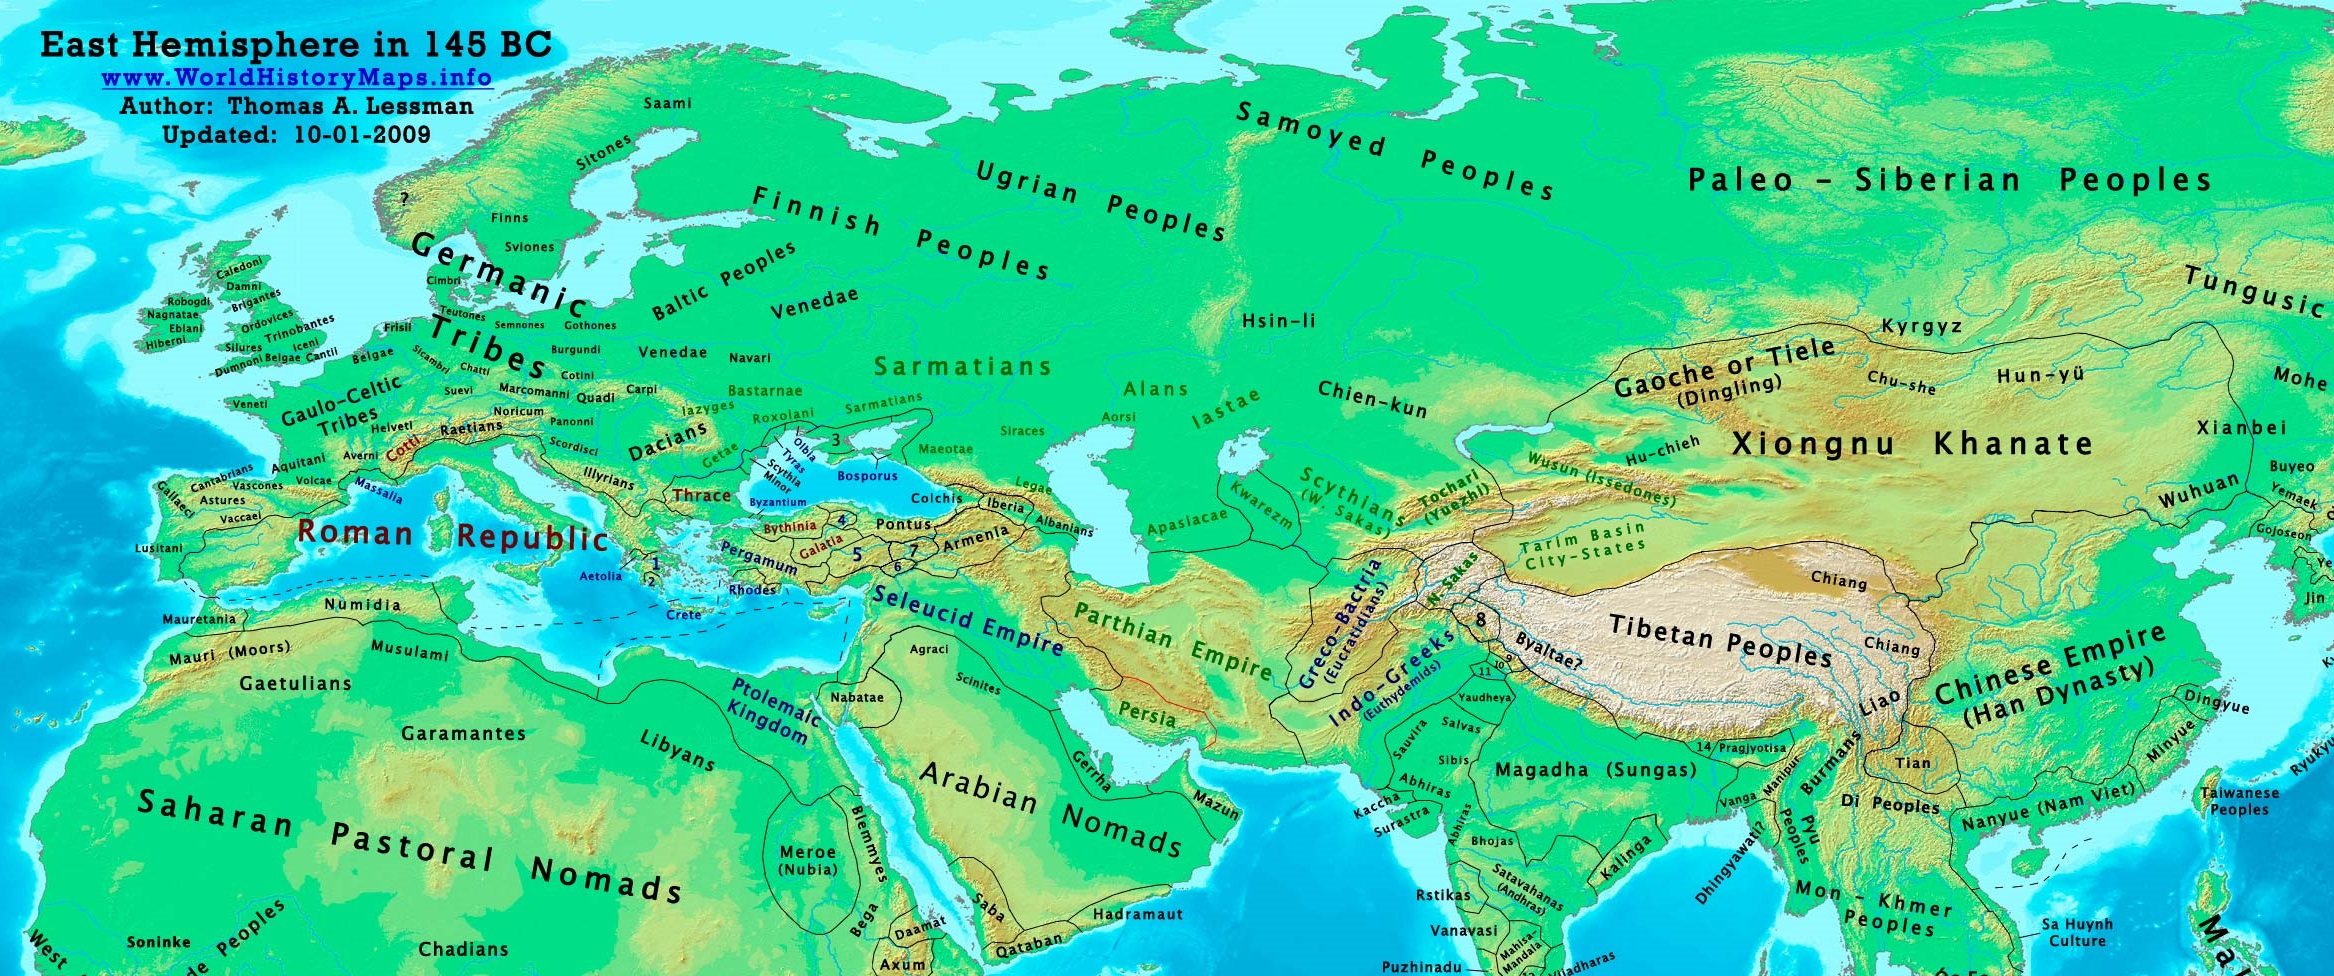 145 BC